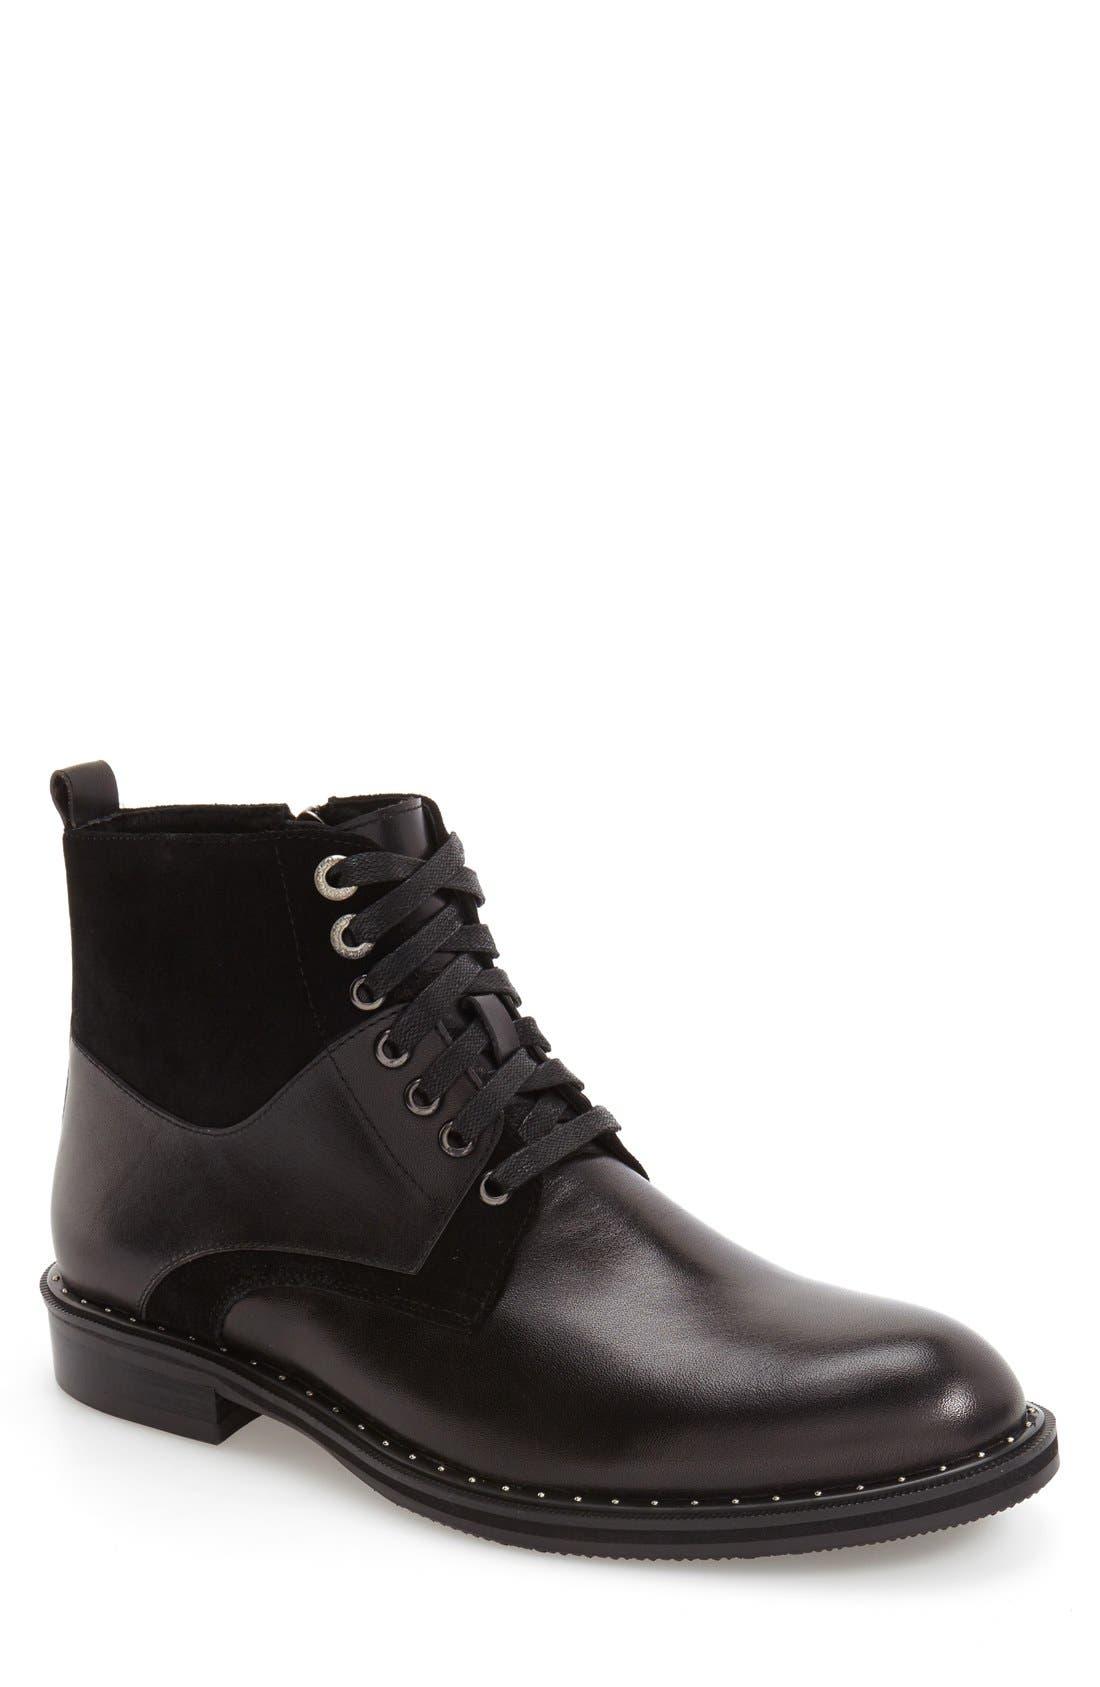 Alternate Image 1 Selected - Zanzara 'Verona' Midi Studded Boot (Men)